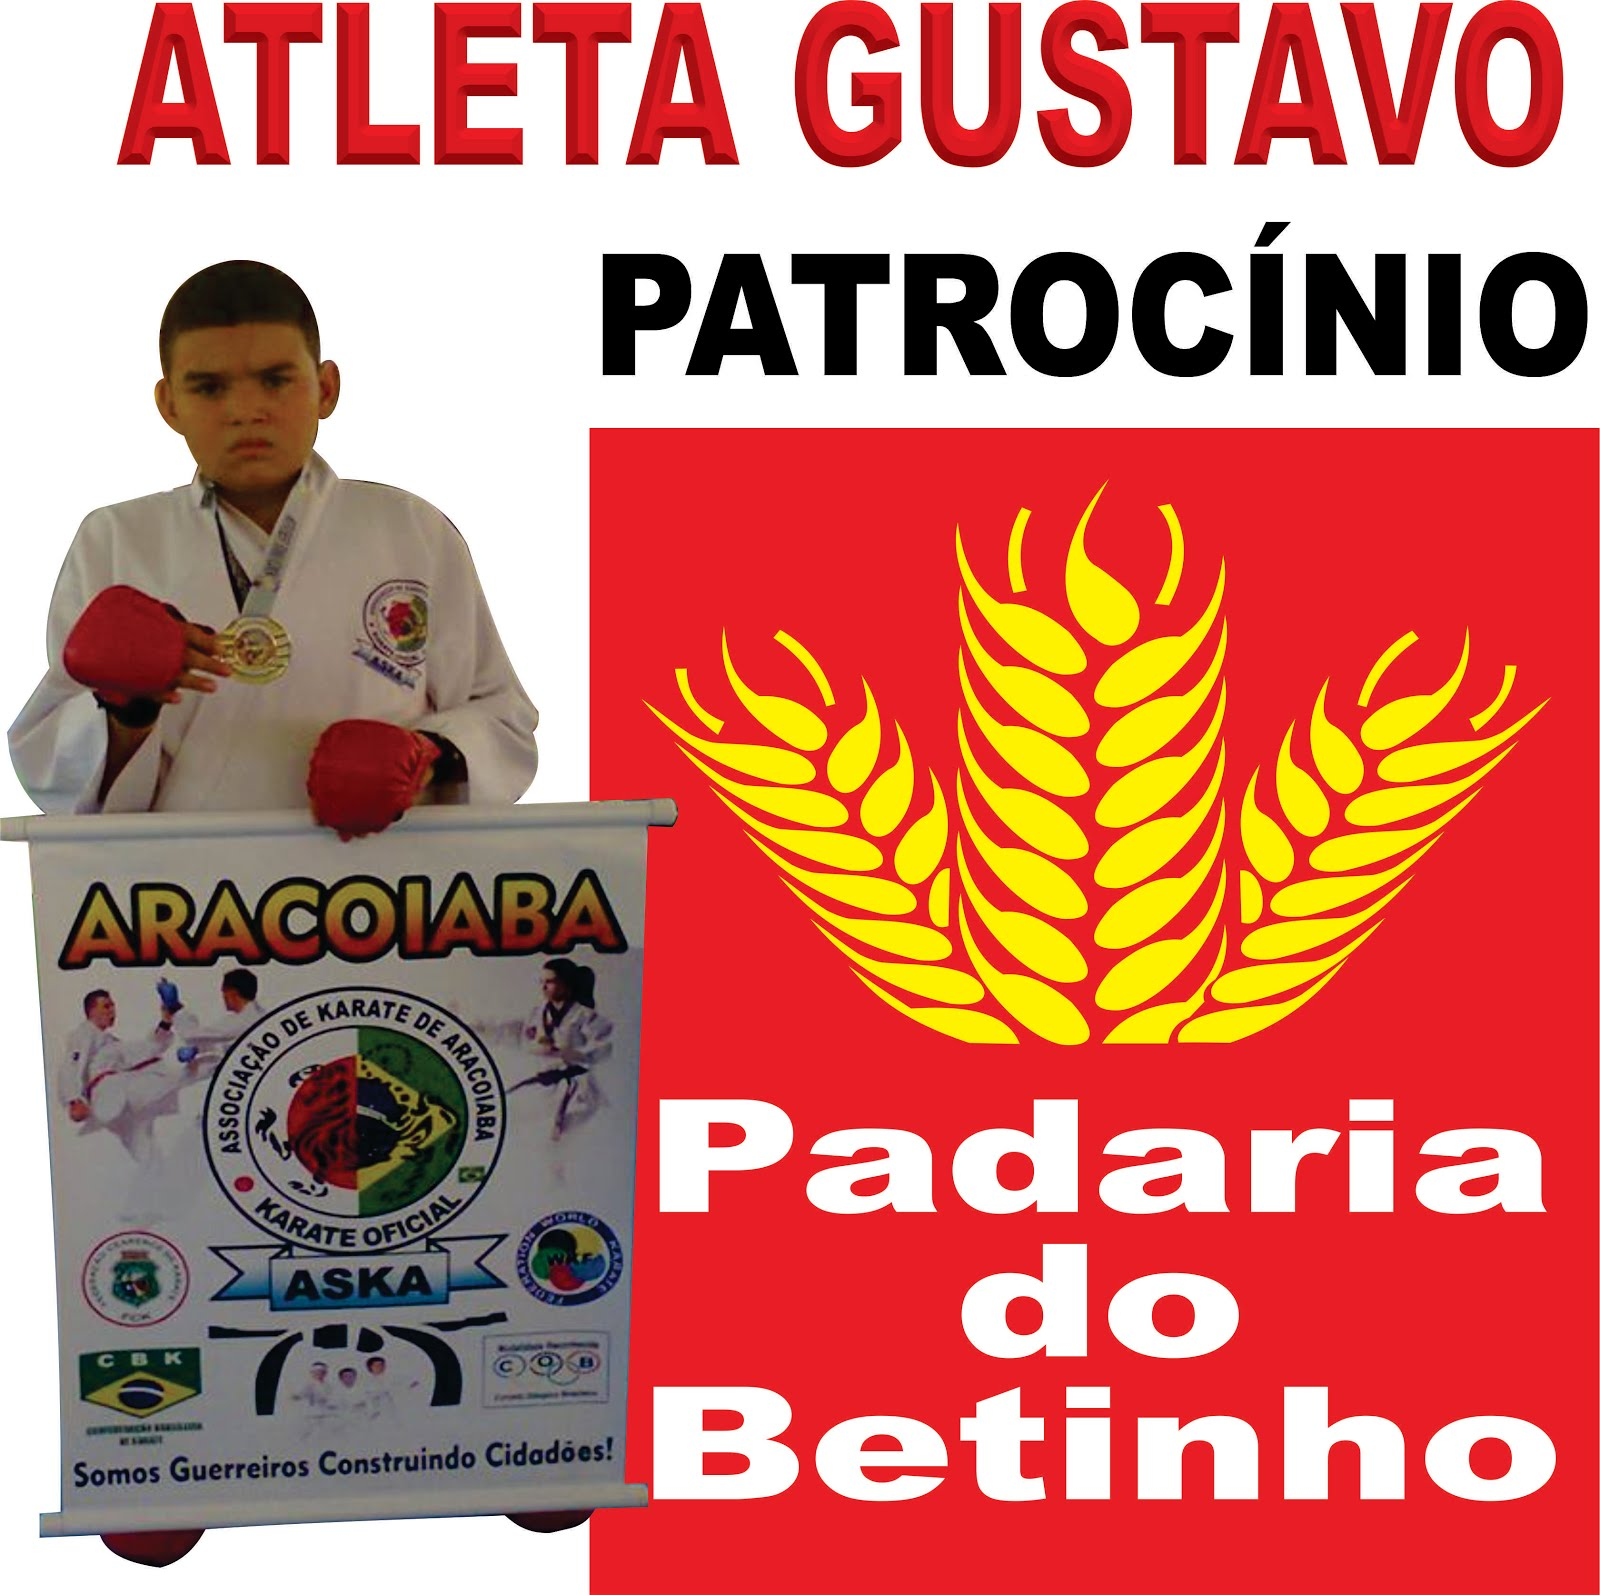 PATROCINIO ATLETA GUSTAVO